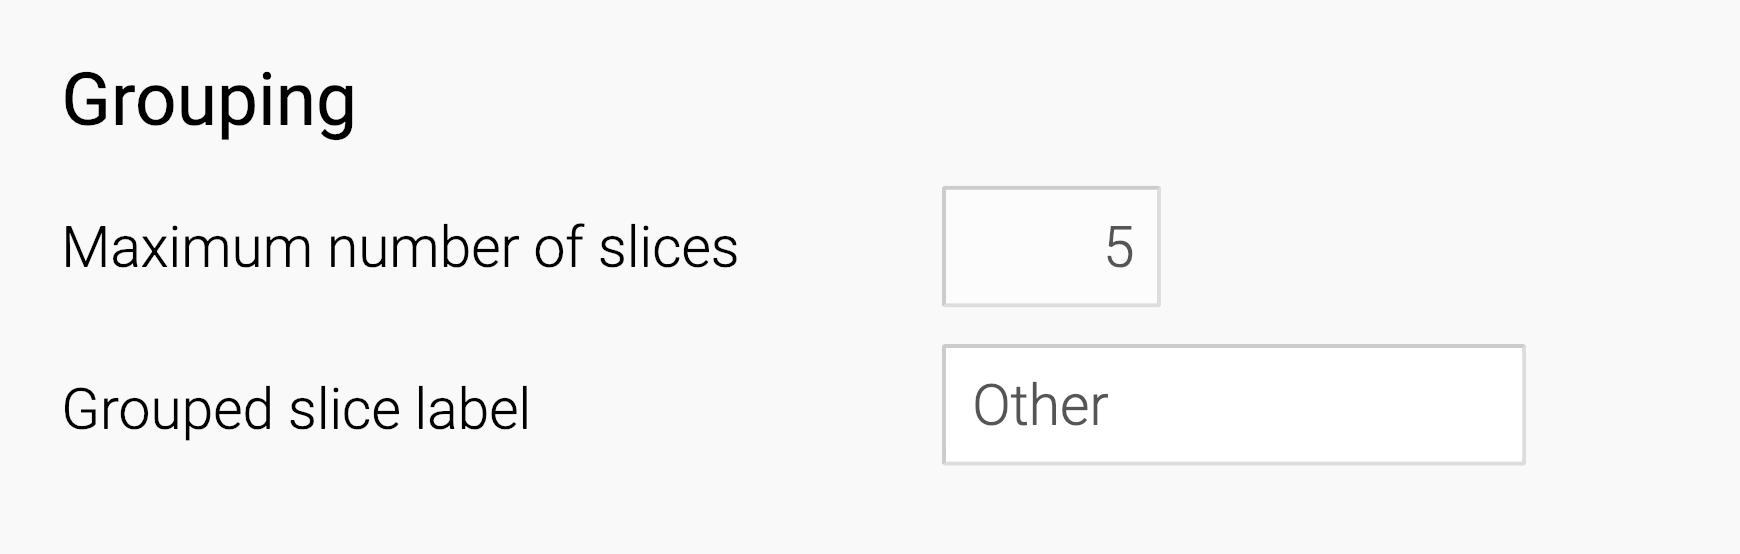 Customizing your donut chart - Datawrapper Academy